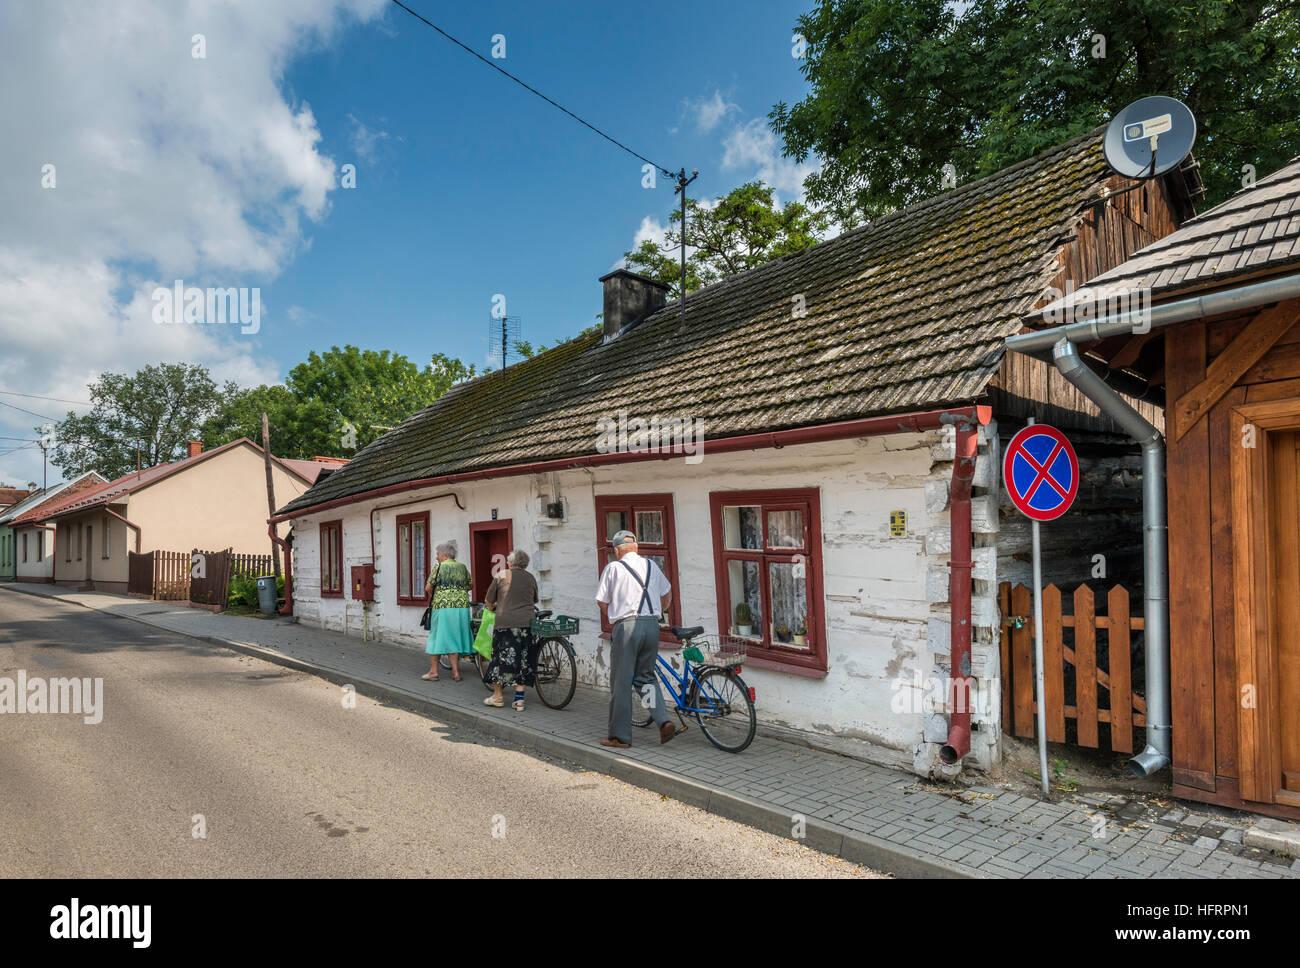 Weavers houses, 18th century, in Przeworsk, Malopolska, Poland - Stock Image